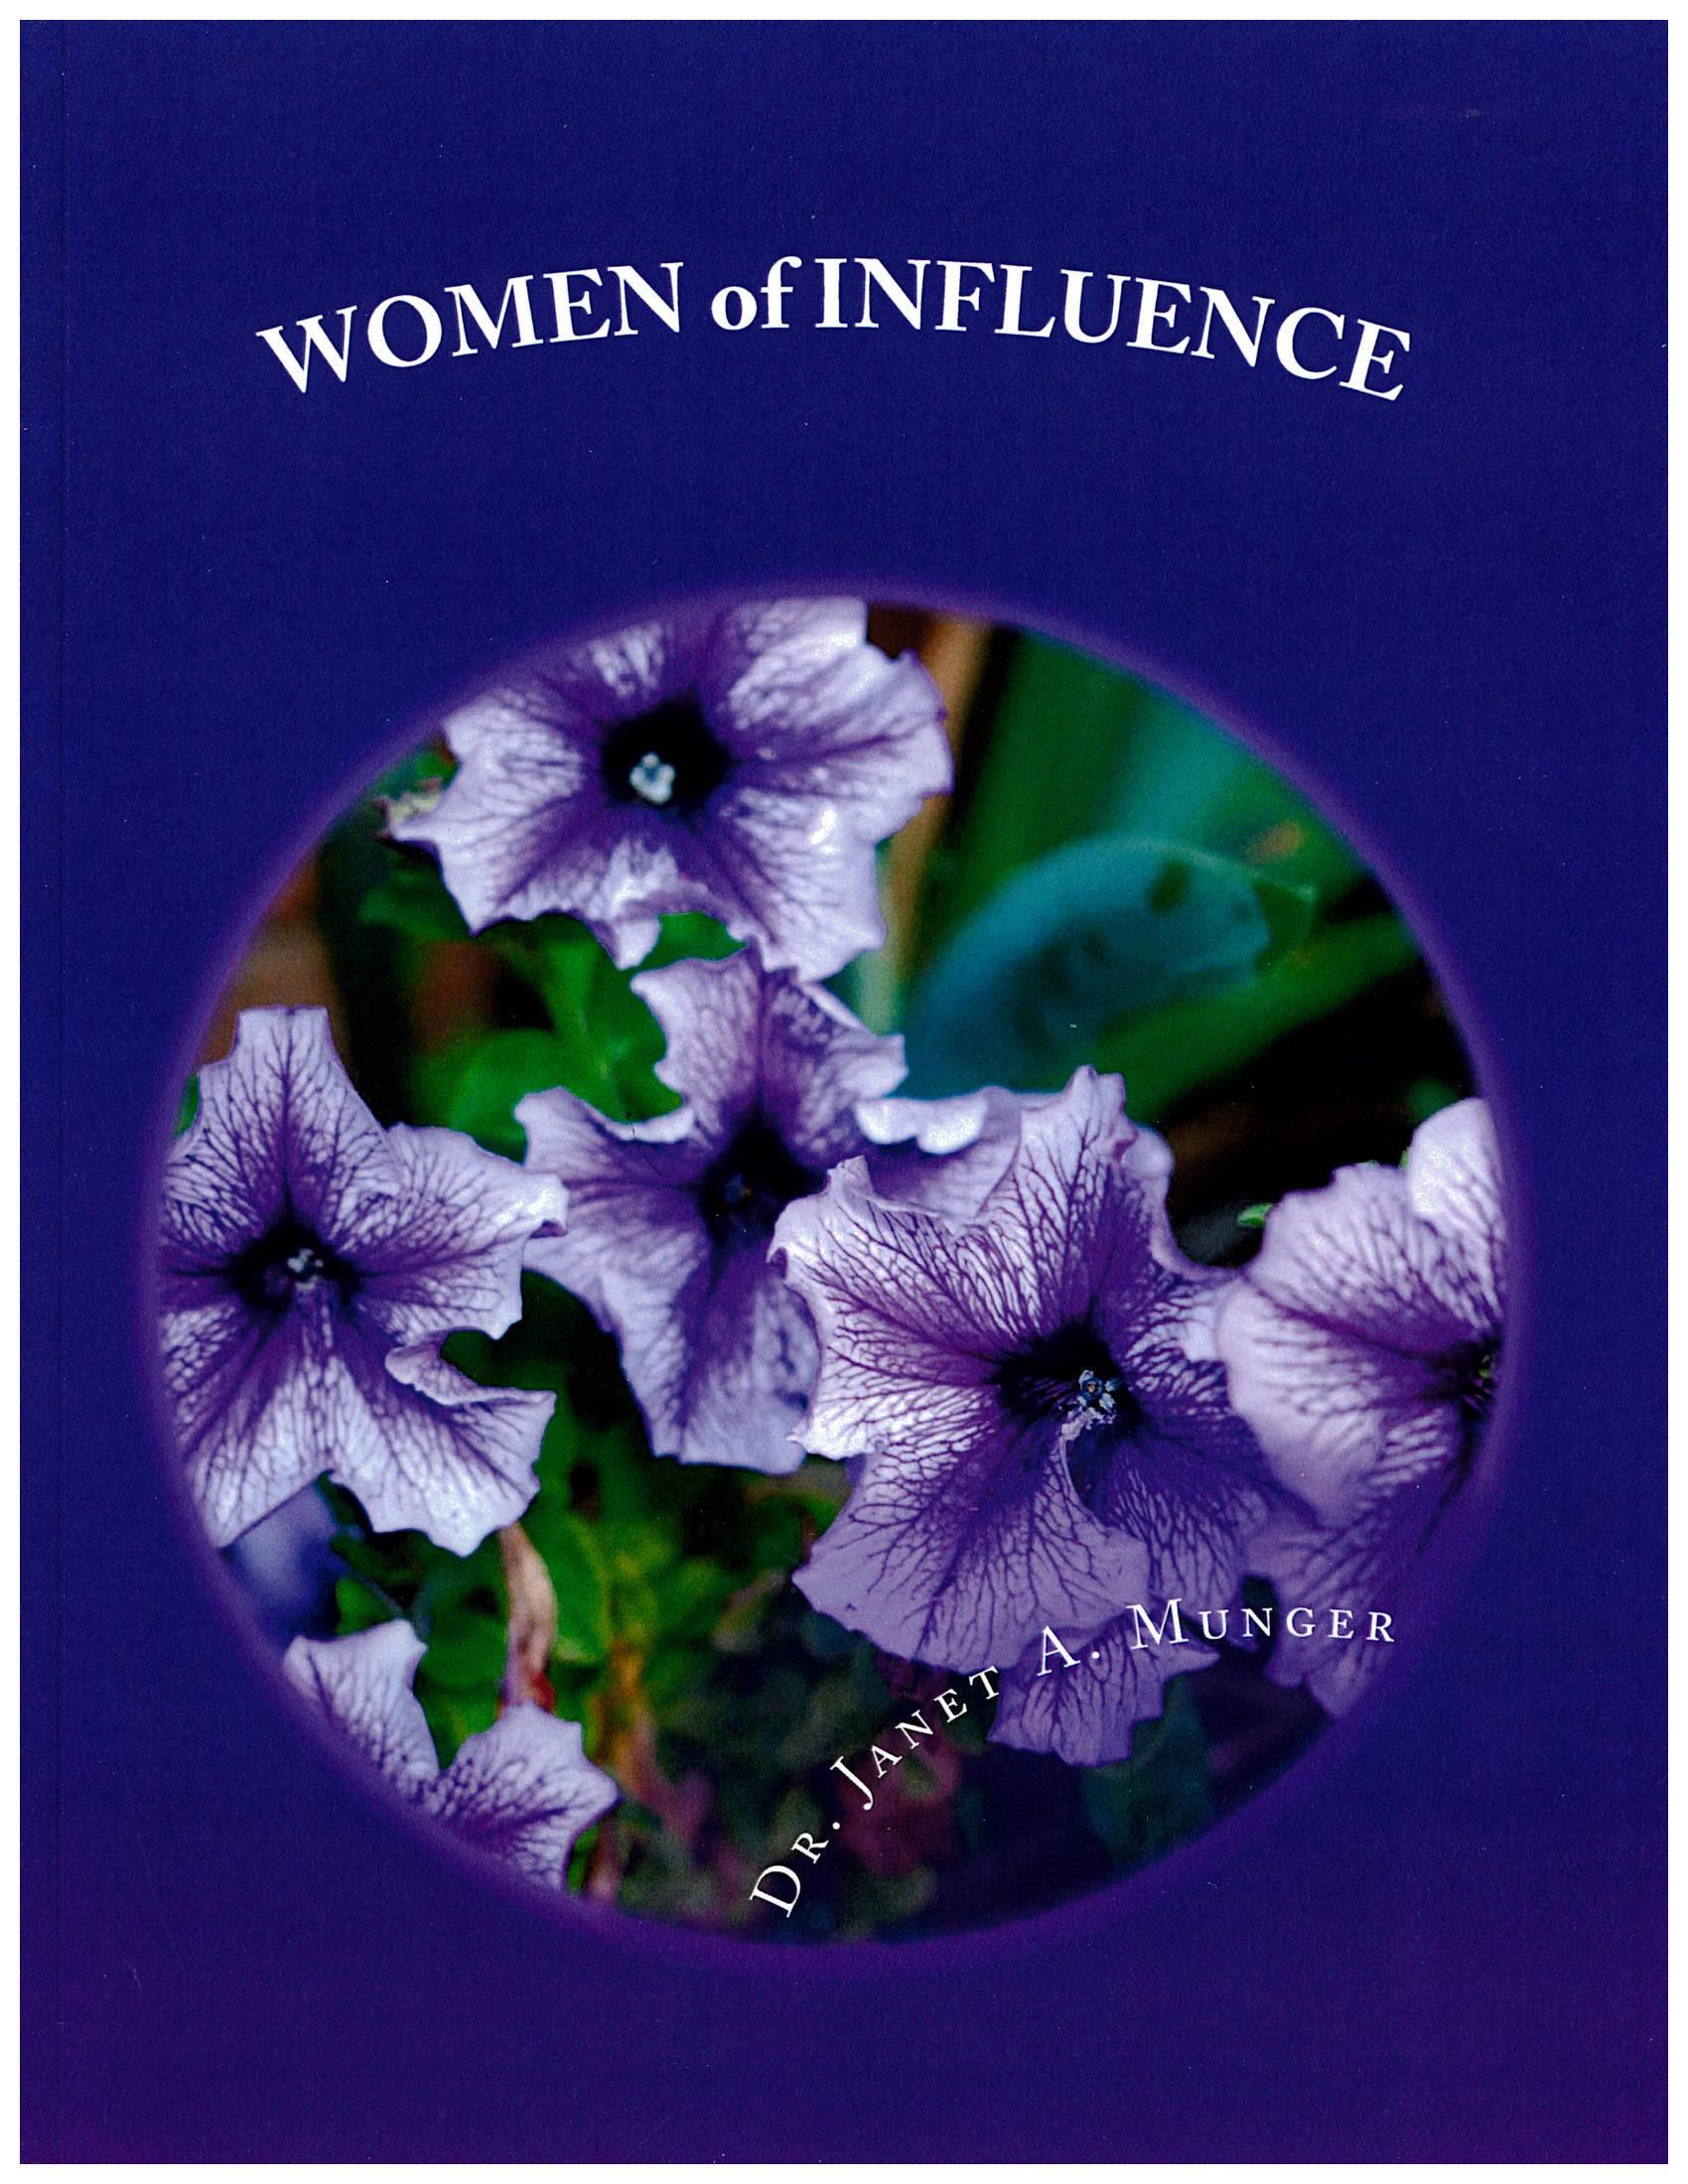 9ced969db3662e6ab290_Facebook_JPG_Reduced_Women_of_Influence_Cover_01-17-17.jpg